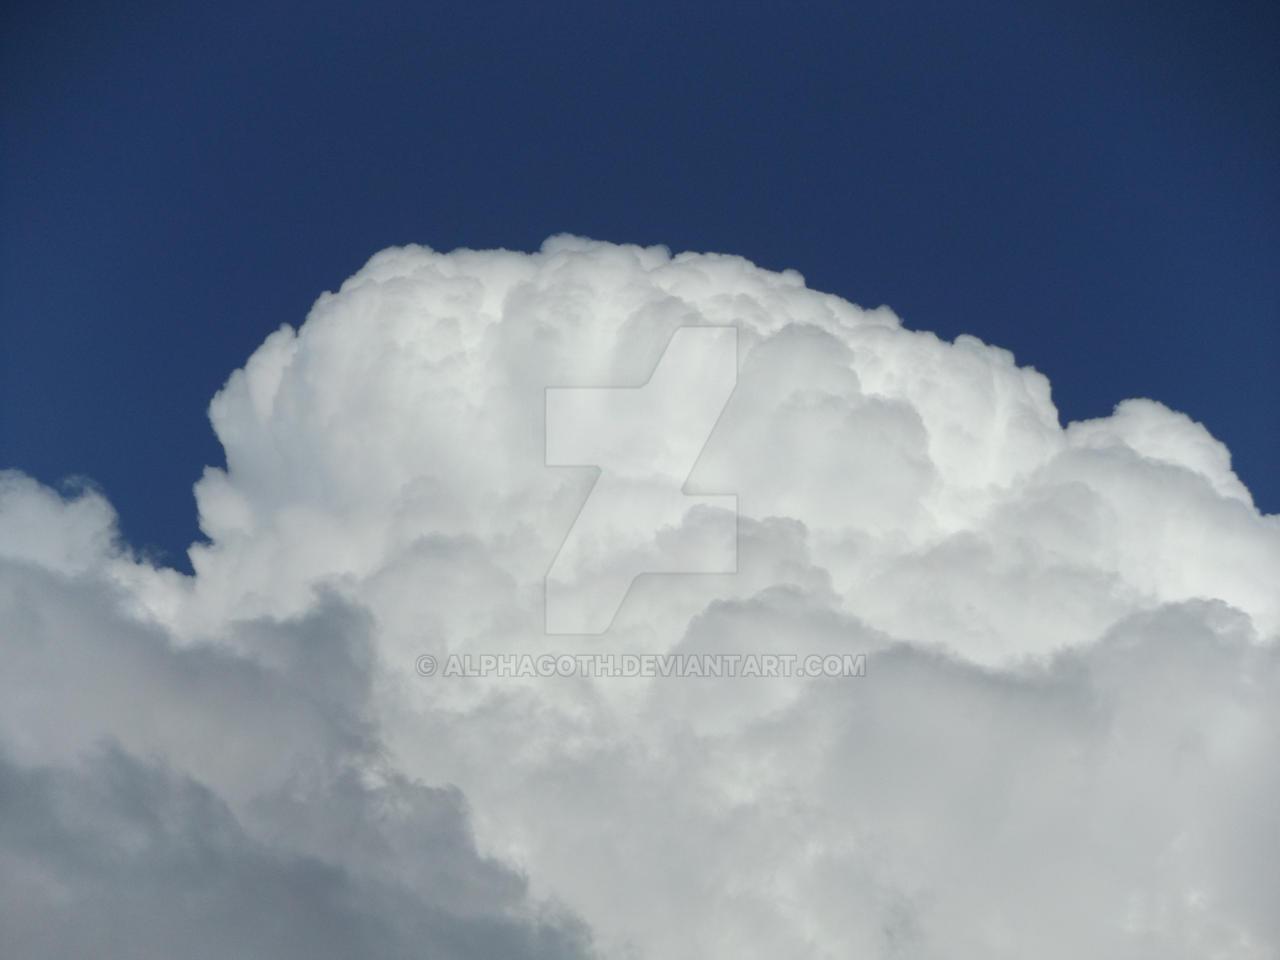 Cloudsdale by Alphagoth